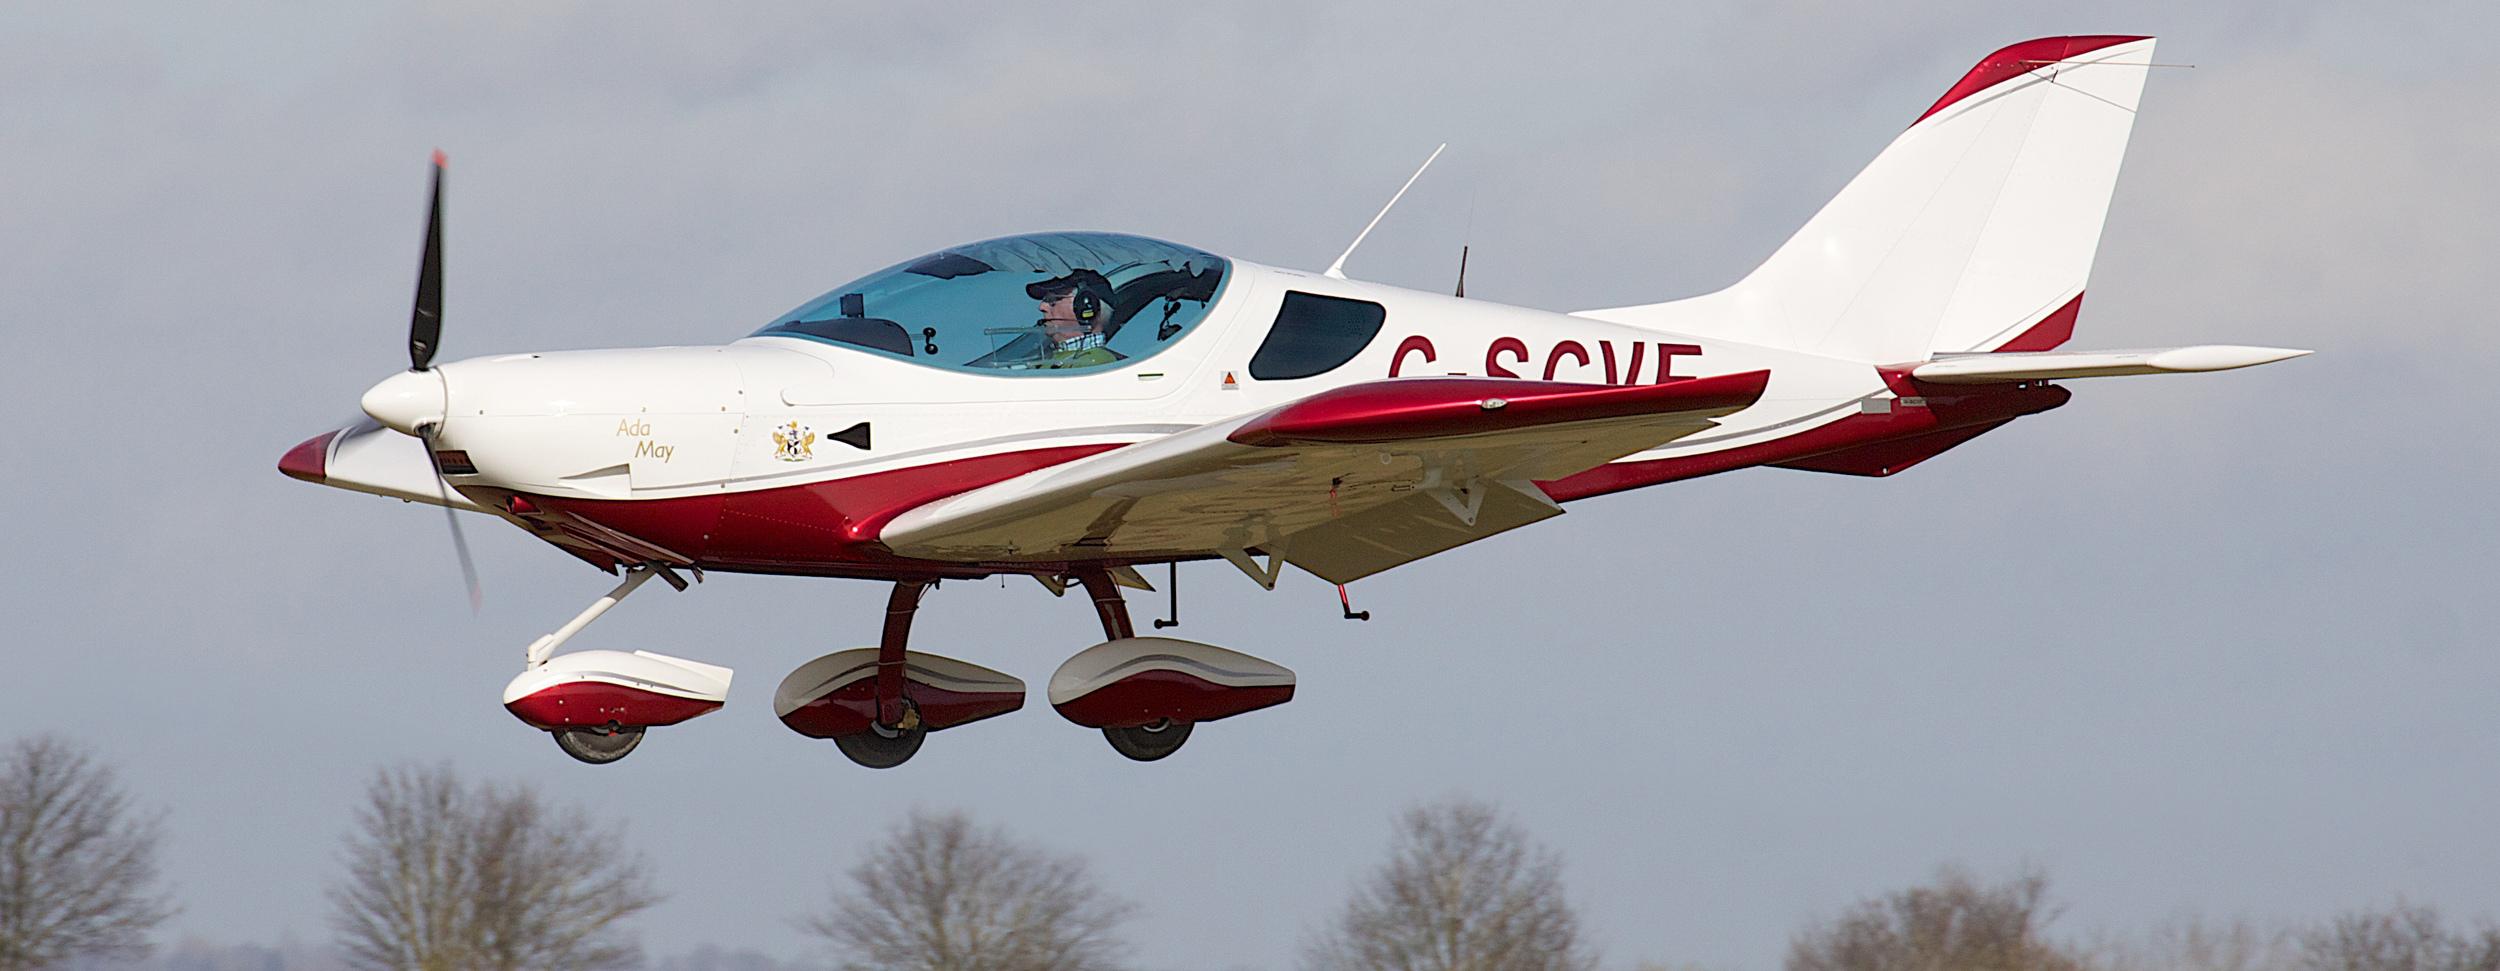 Vic Flintham piloting his Czech Sportcruiser G-SCVF at Fowlmere in 2015